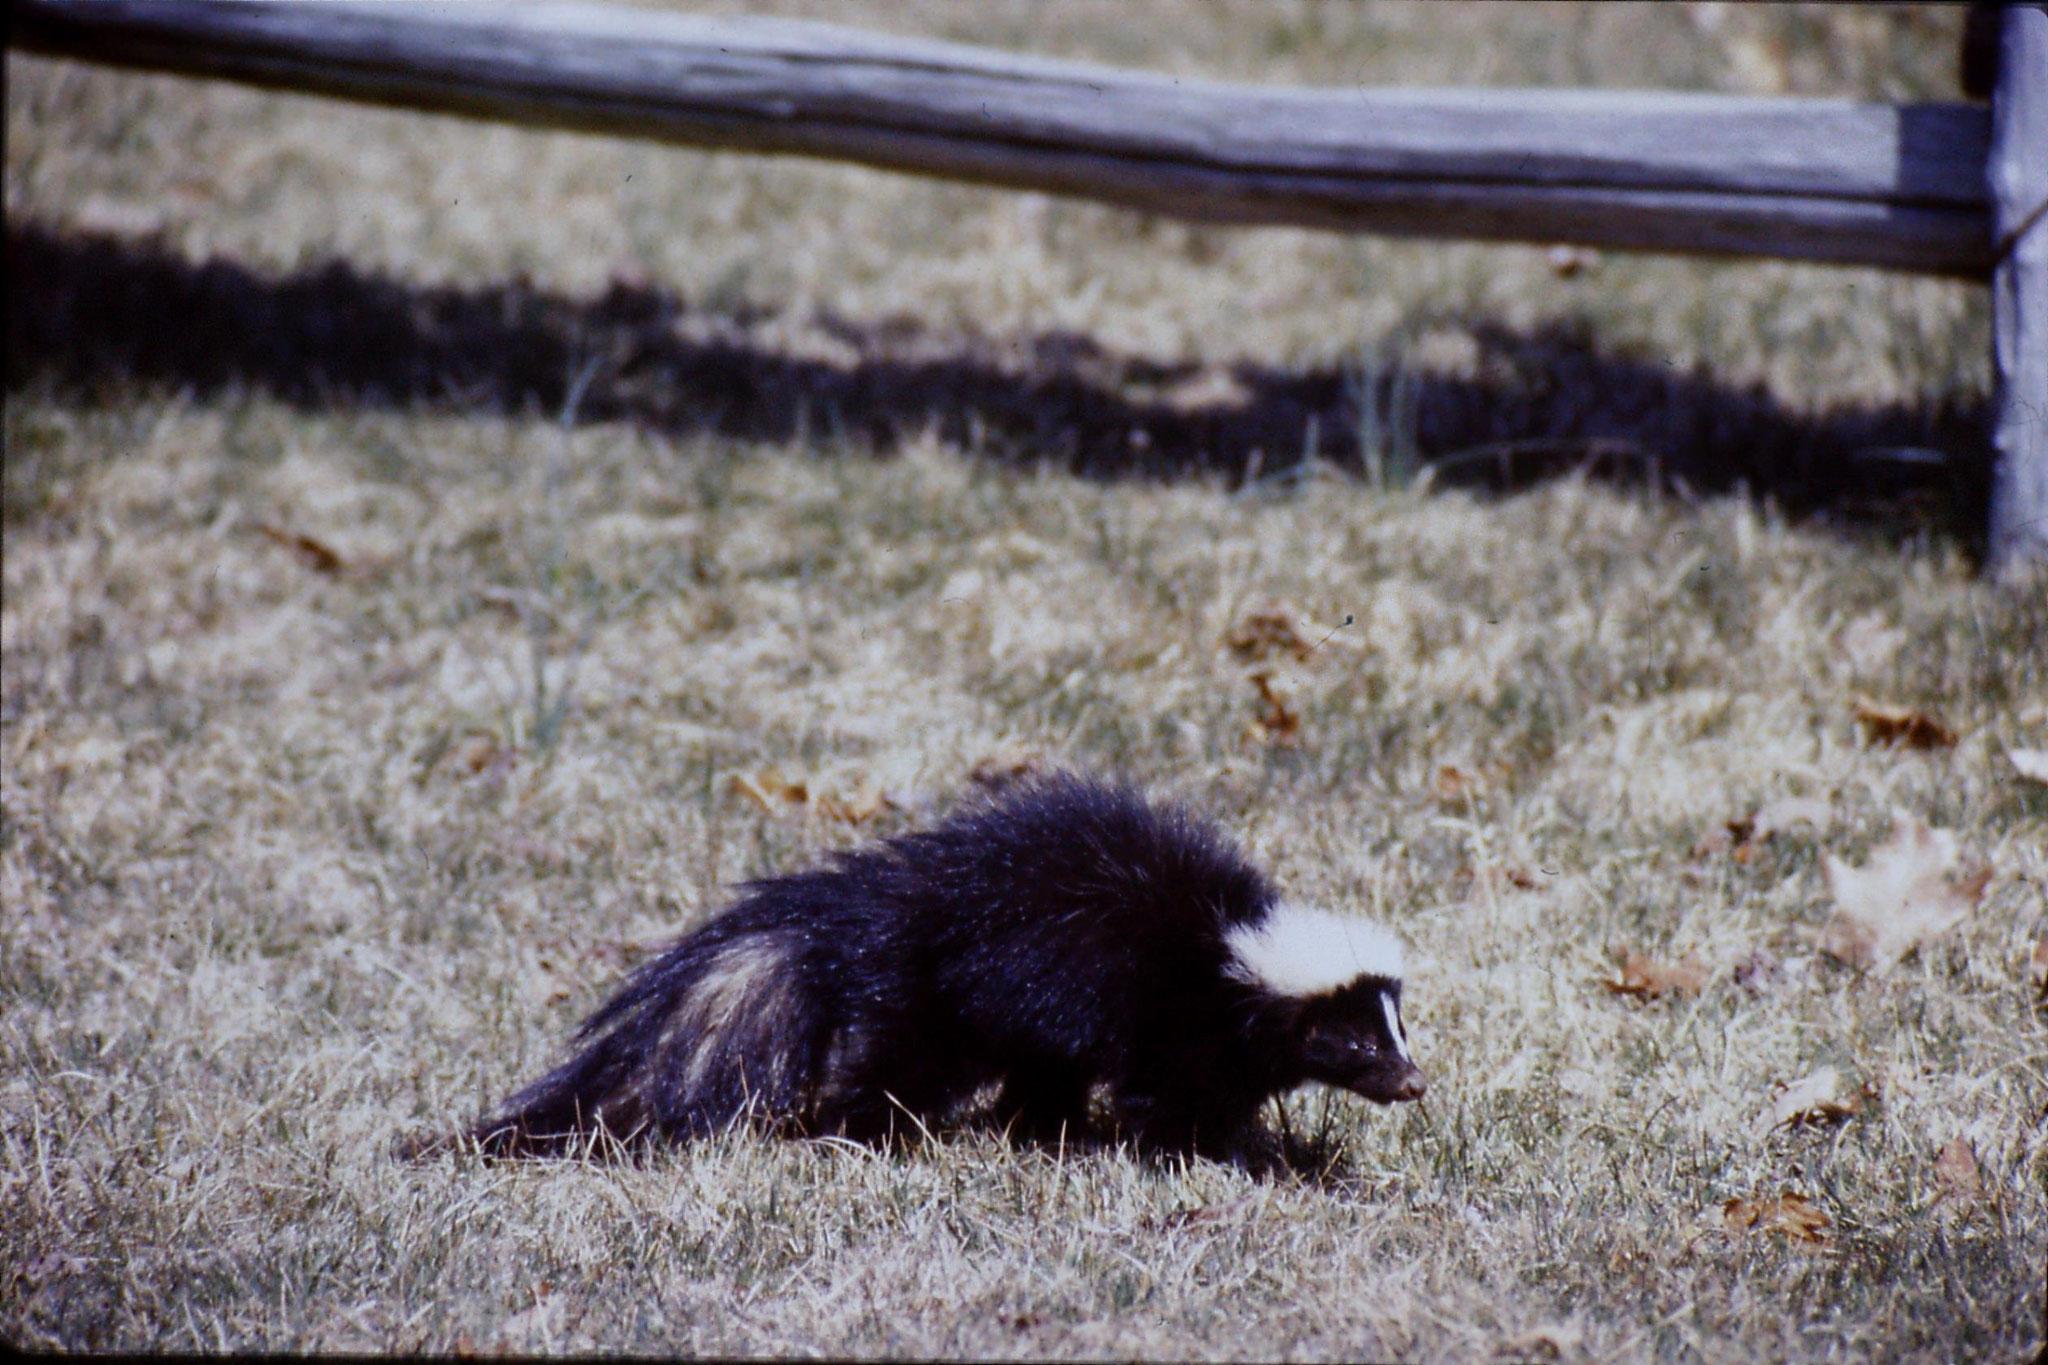 17/3/1991: 28: Benge Gap skunk